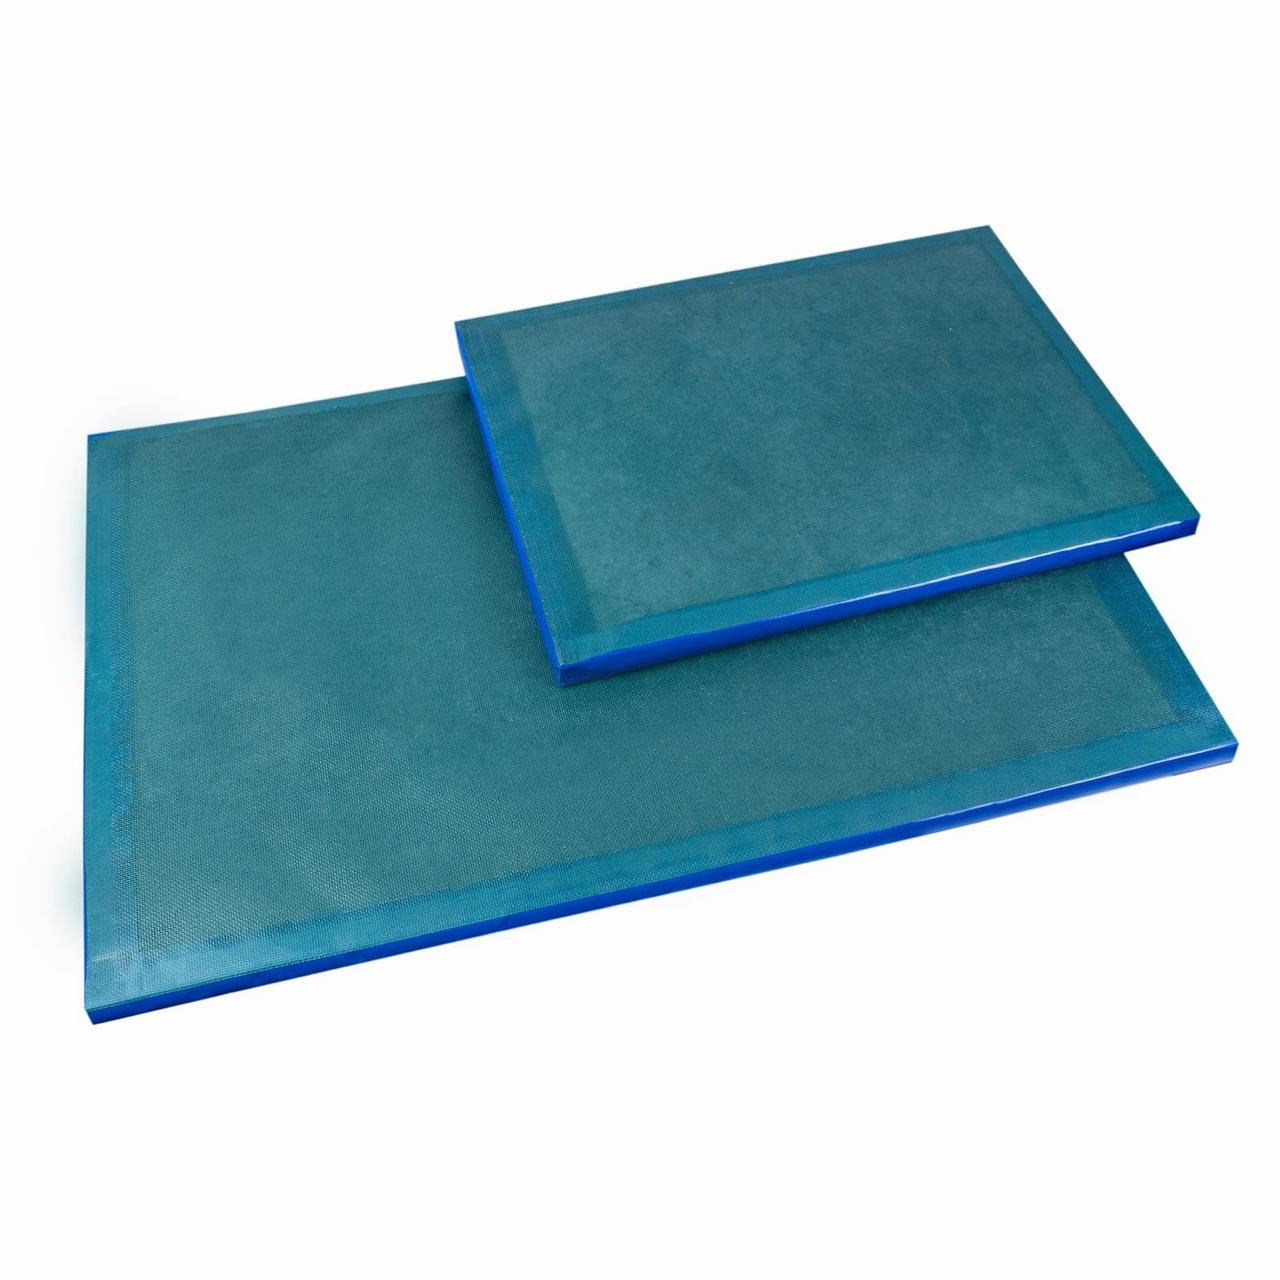 Офисный дезинфицирующий коврик 100х150х4 см